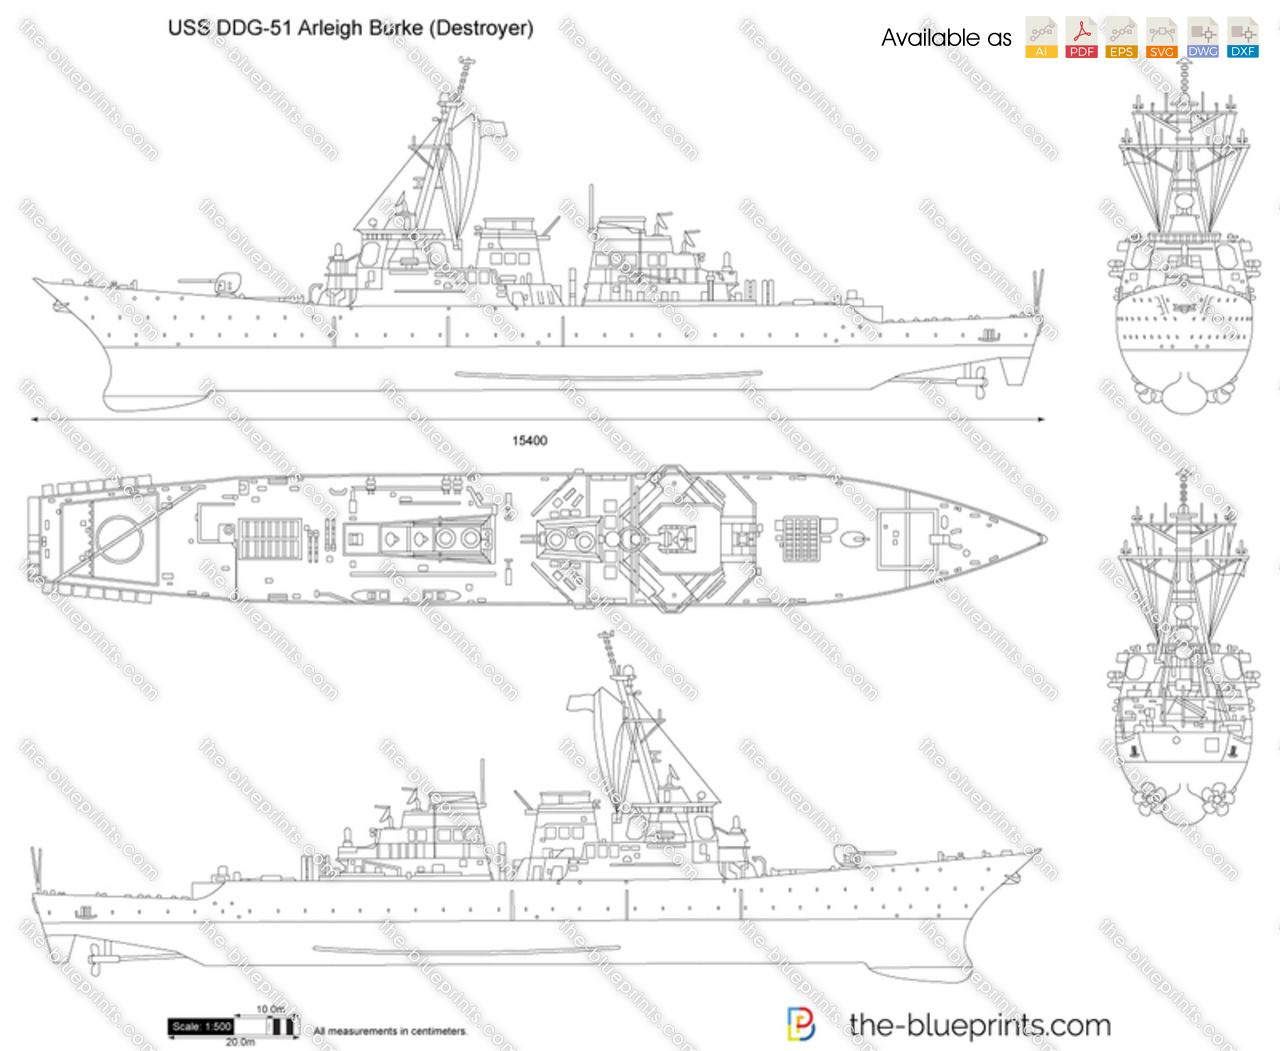 Uss Ddg 51 Arleigh Burke Destroyer Vector Drawing